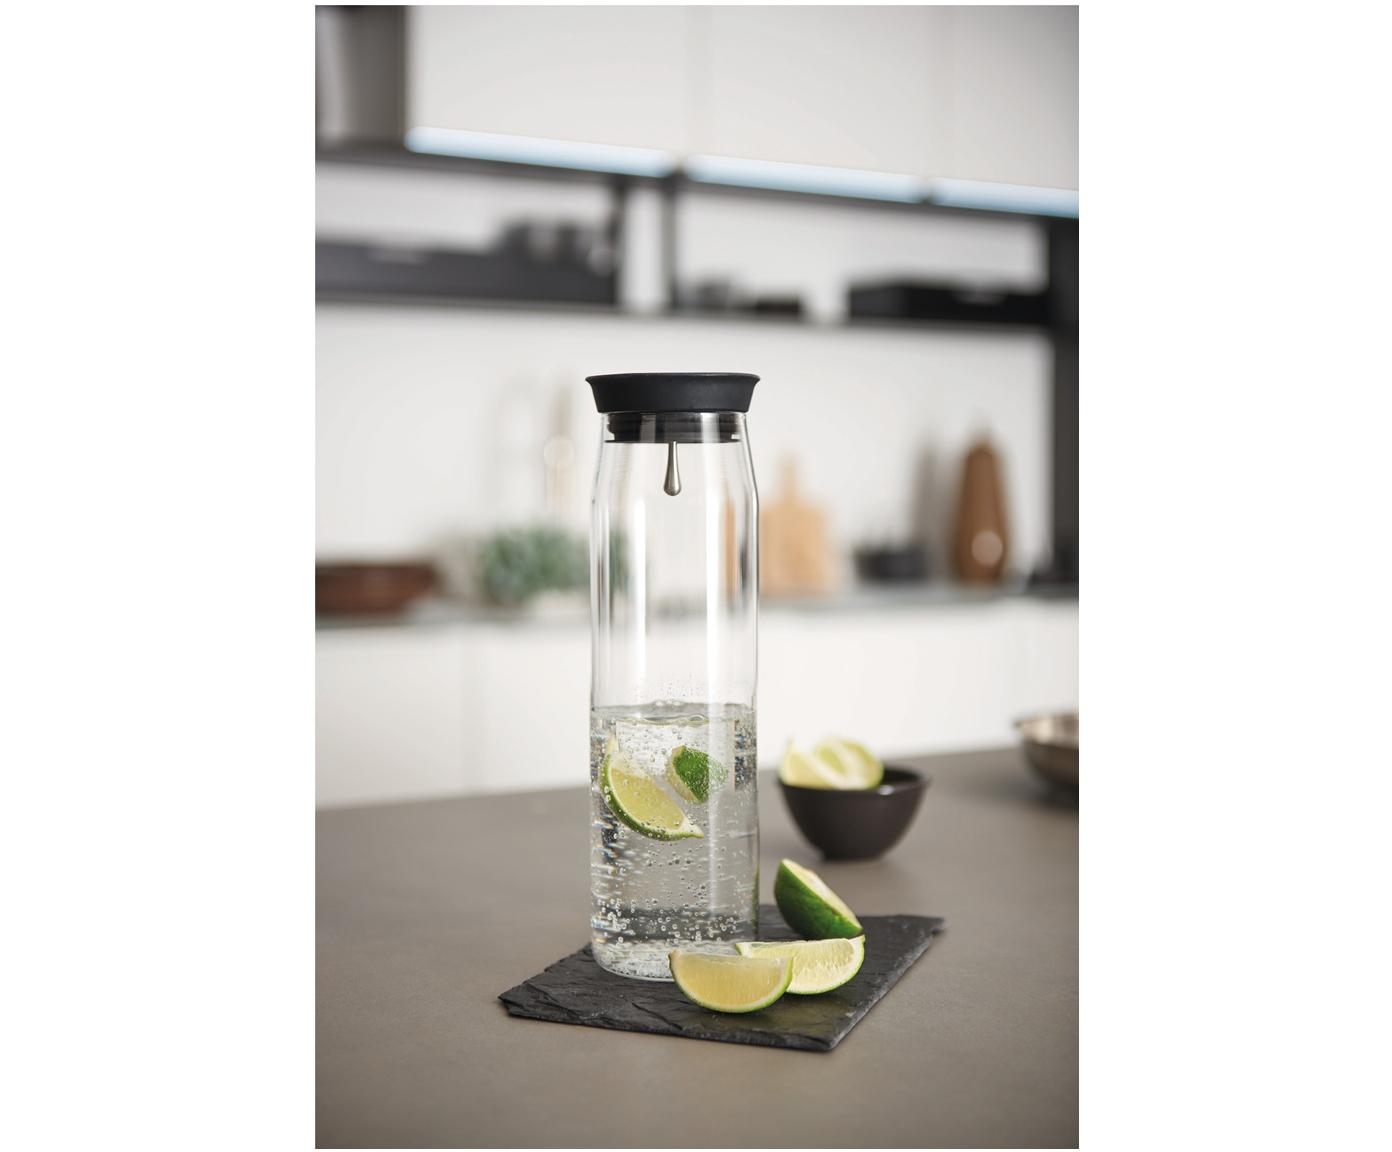 Grosse Karaffe Brioso, Glas, Silikon, Transparent, 1.1 L